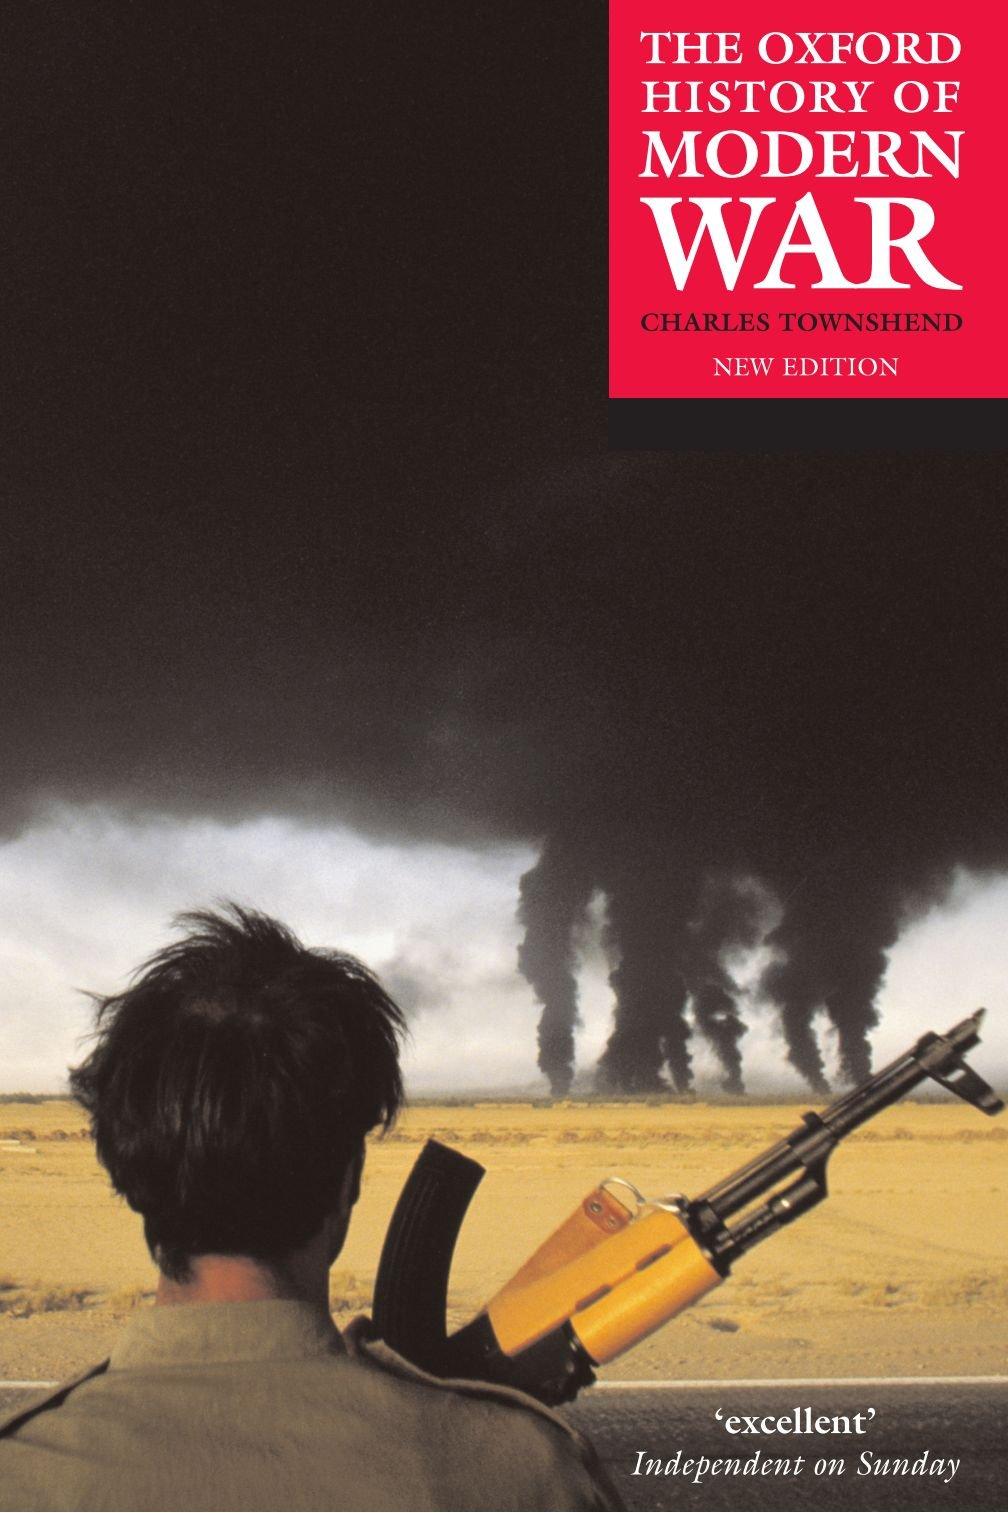 """Historia moderna de la guerra de Oxford"", por Charles Townshend"